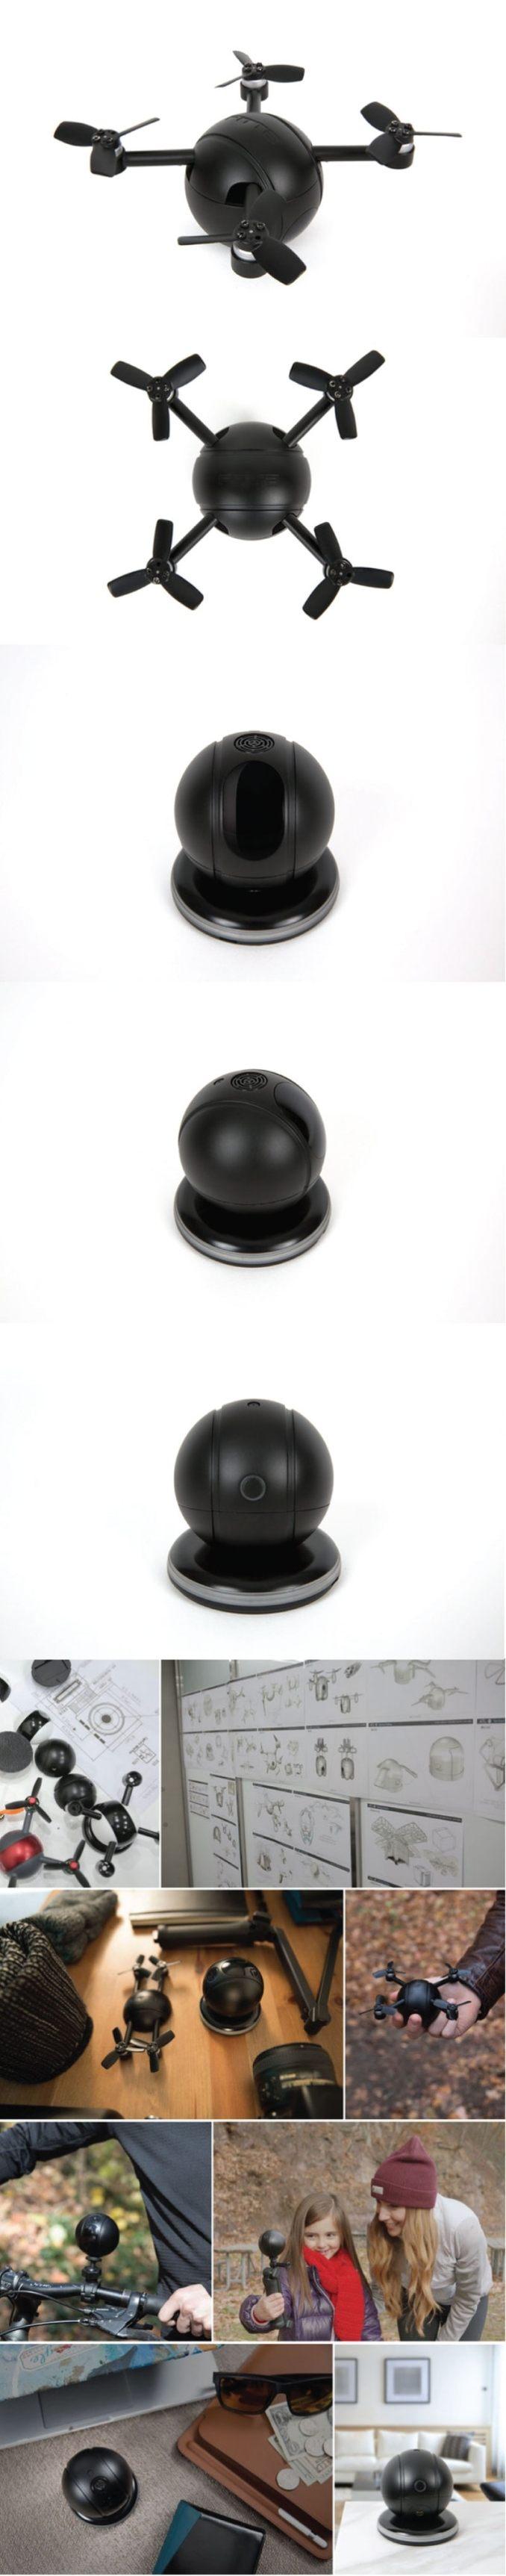 pitta-drohne-actionkamera-actioncam-ip-überwachungskamera-6